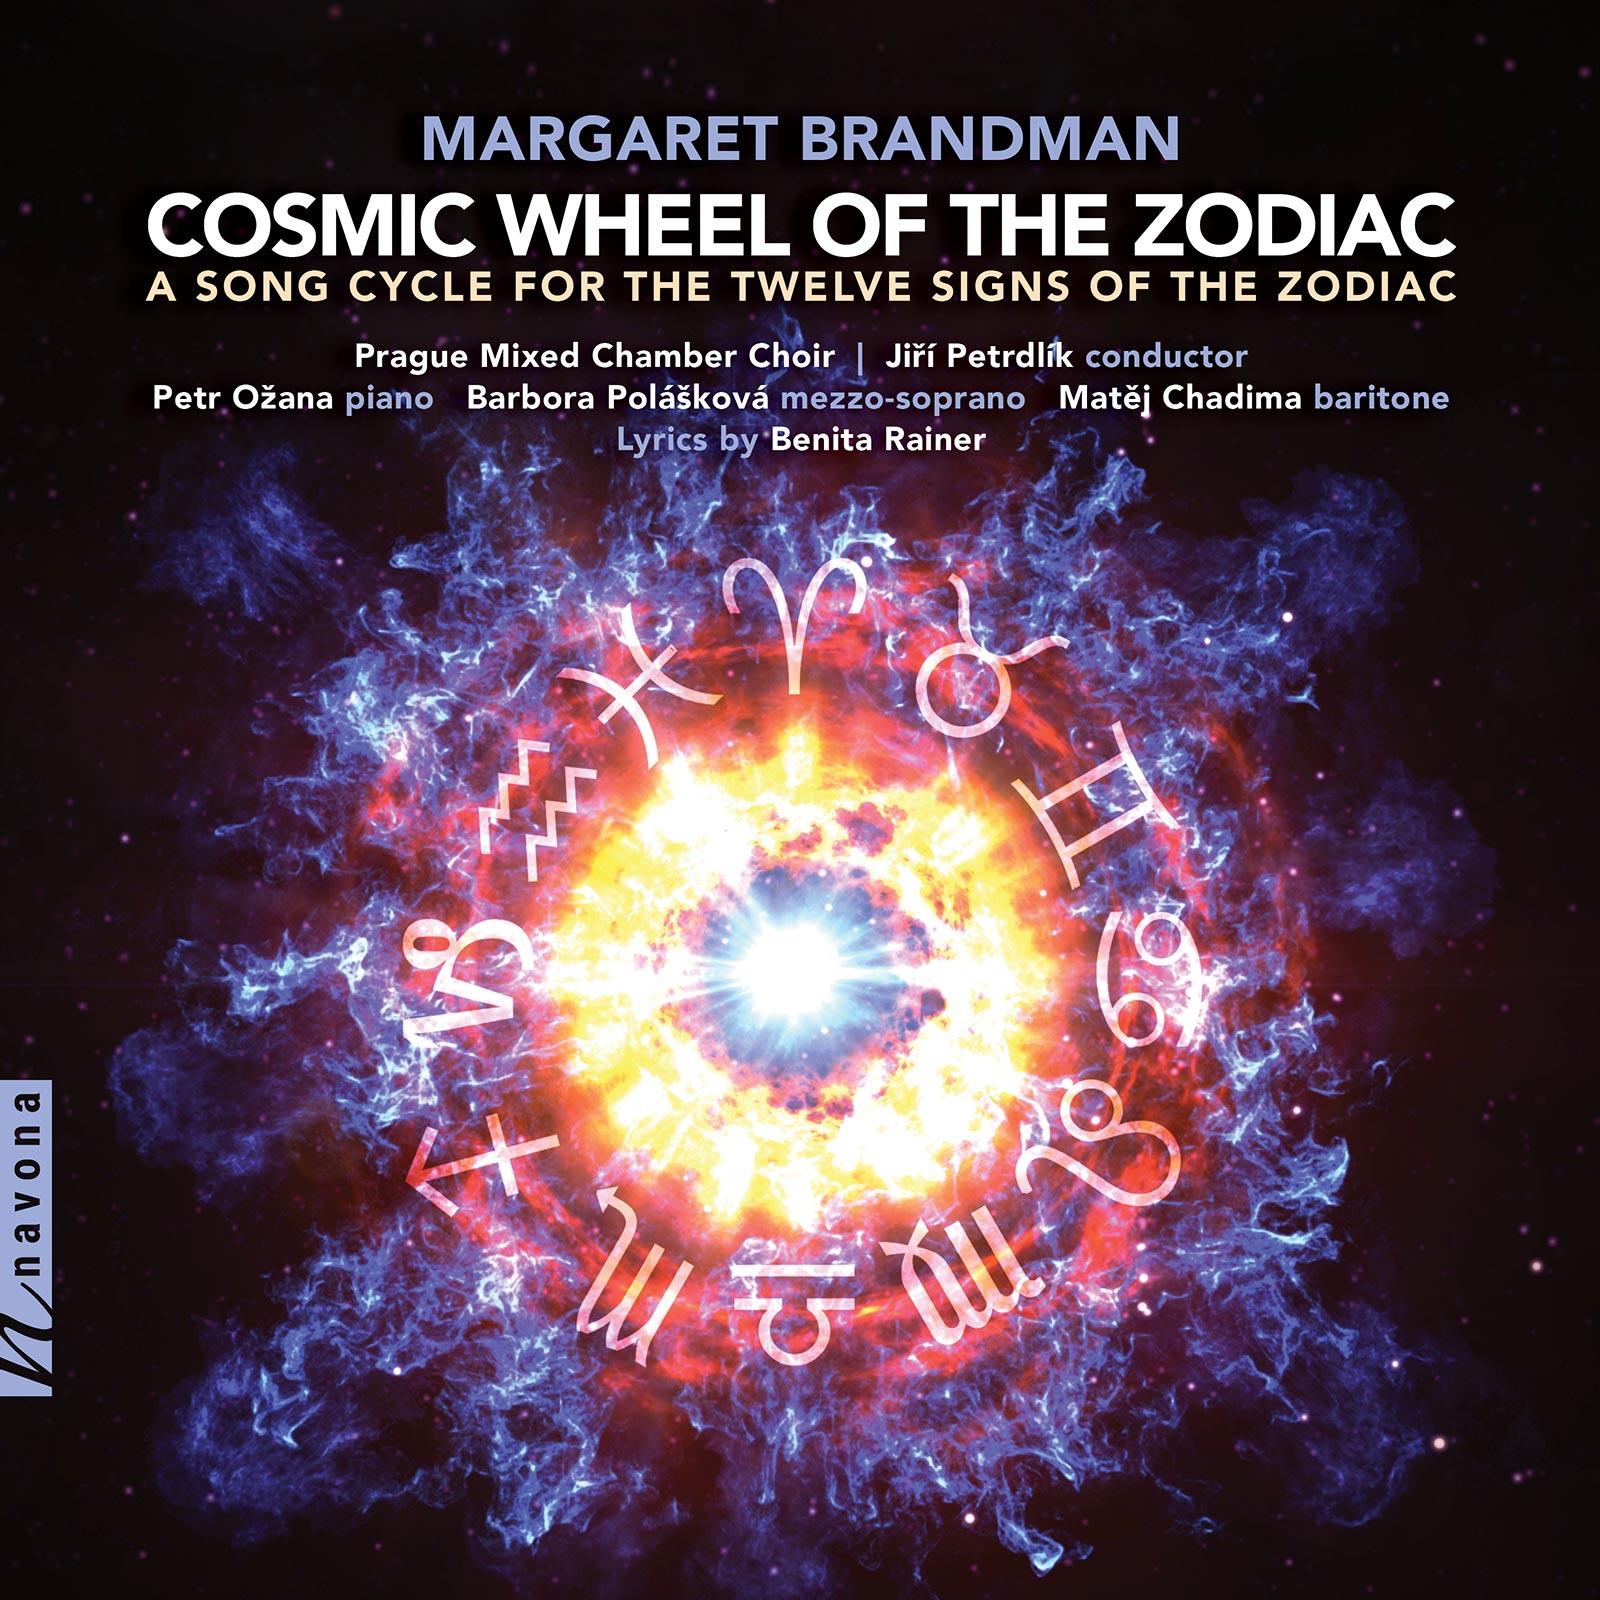 Cosmic Wheel of the Zodiac